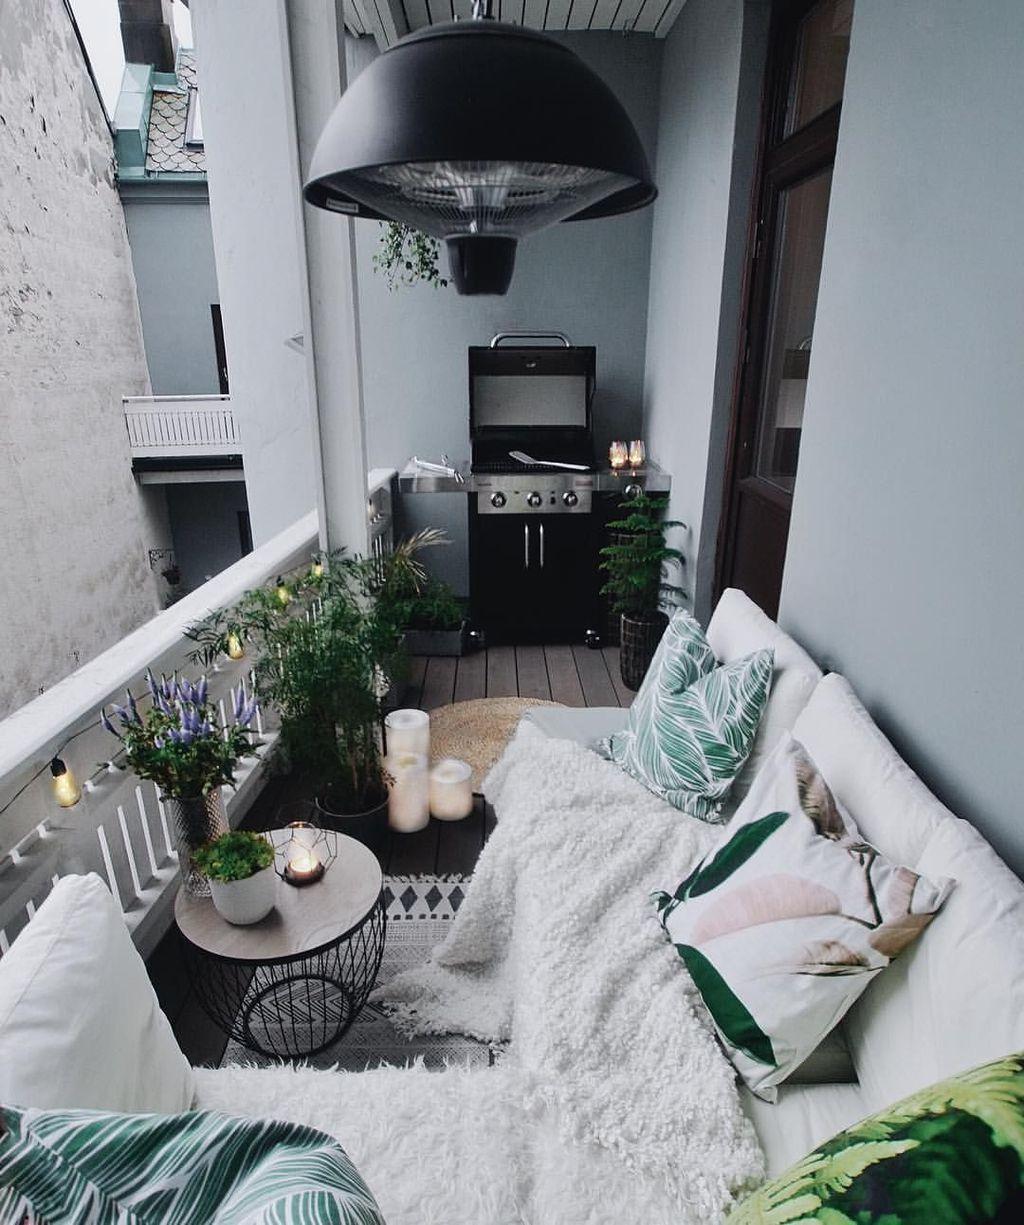 36 Awesome Small Balcony Garden Ideas #apartmentbalconydecorating